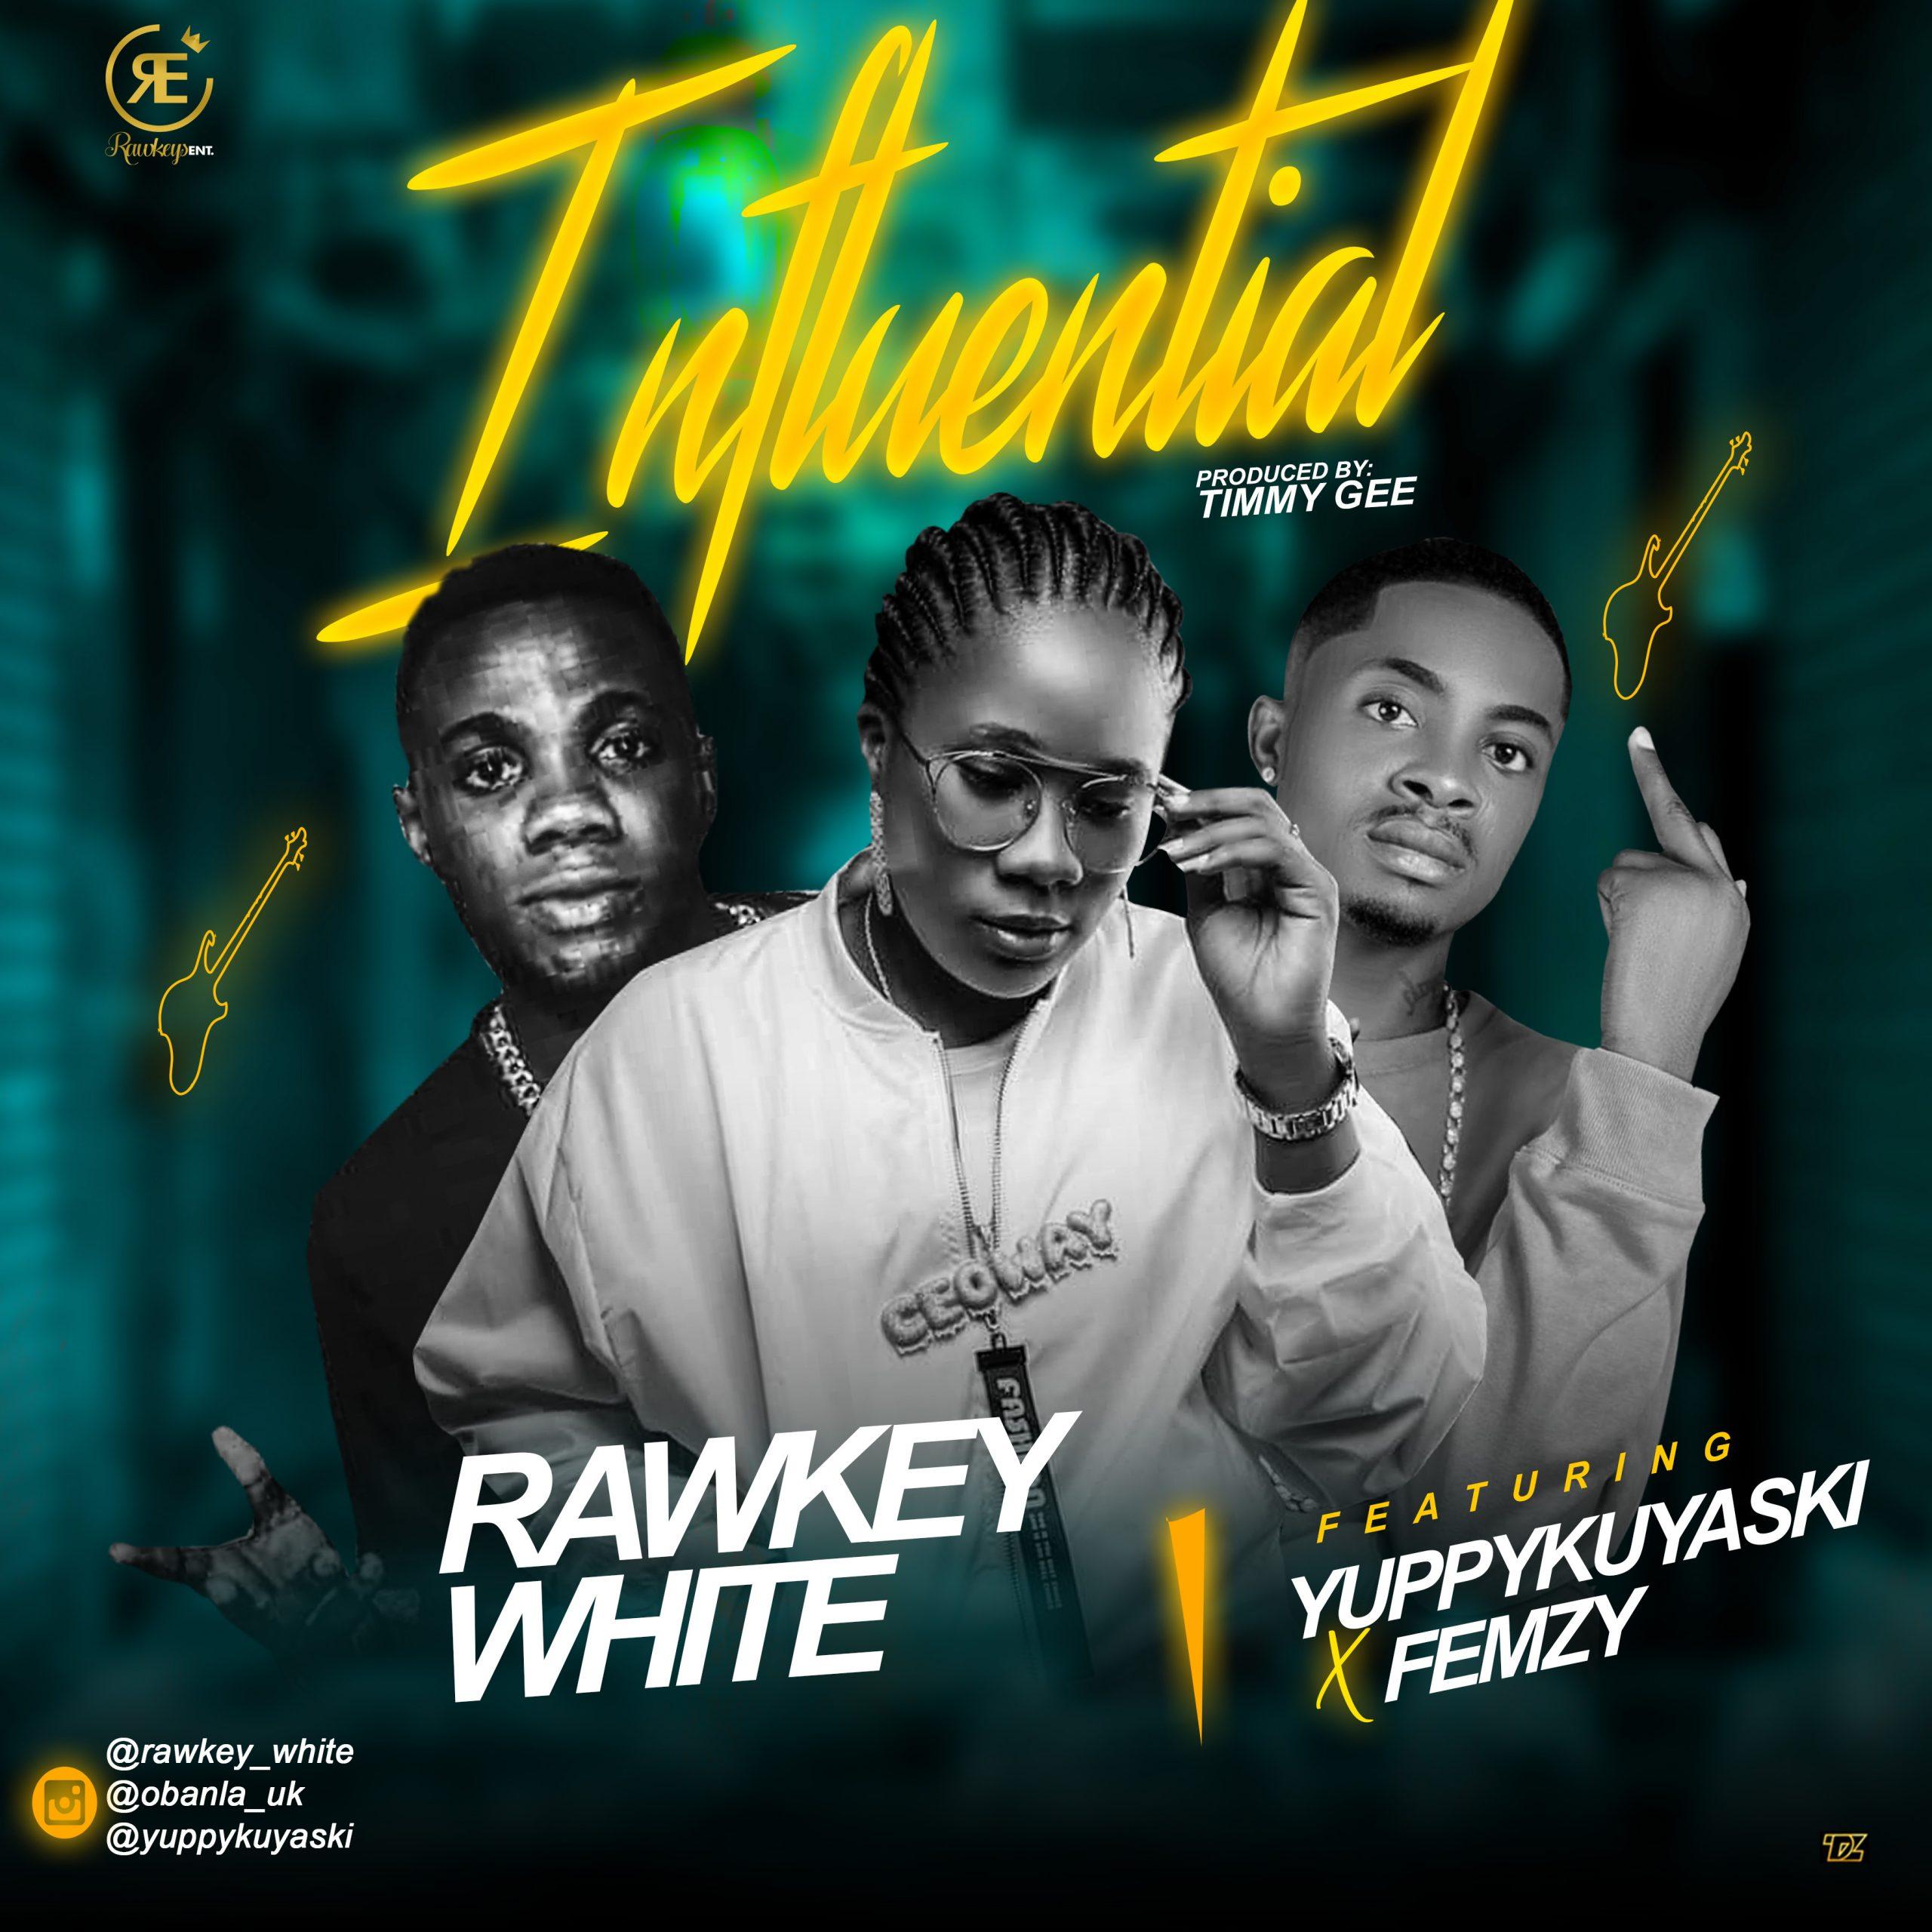 (Music + Video) Rawkeywhite Feat. Yuppykuyaski X Femzy_ Influential 1 776